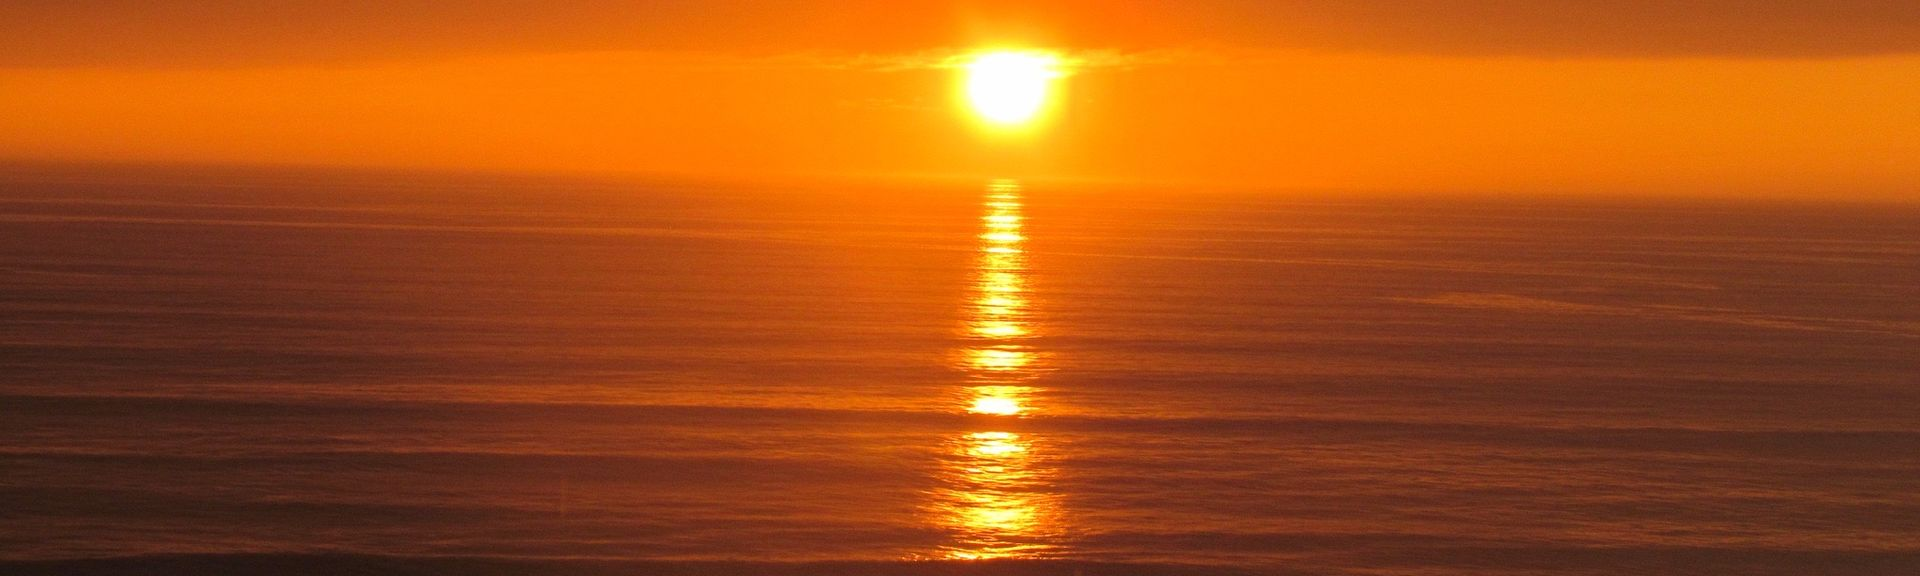 SeaScape, Solana Beach, California, United States of America